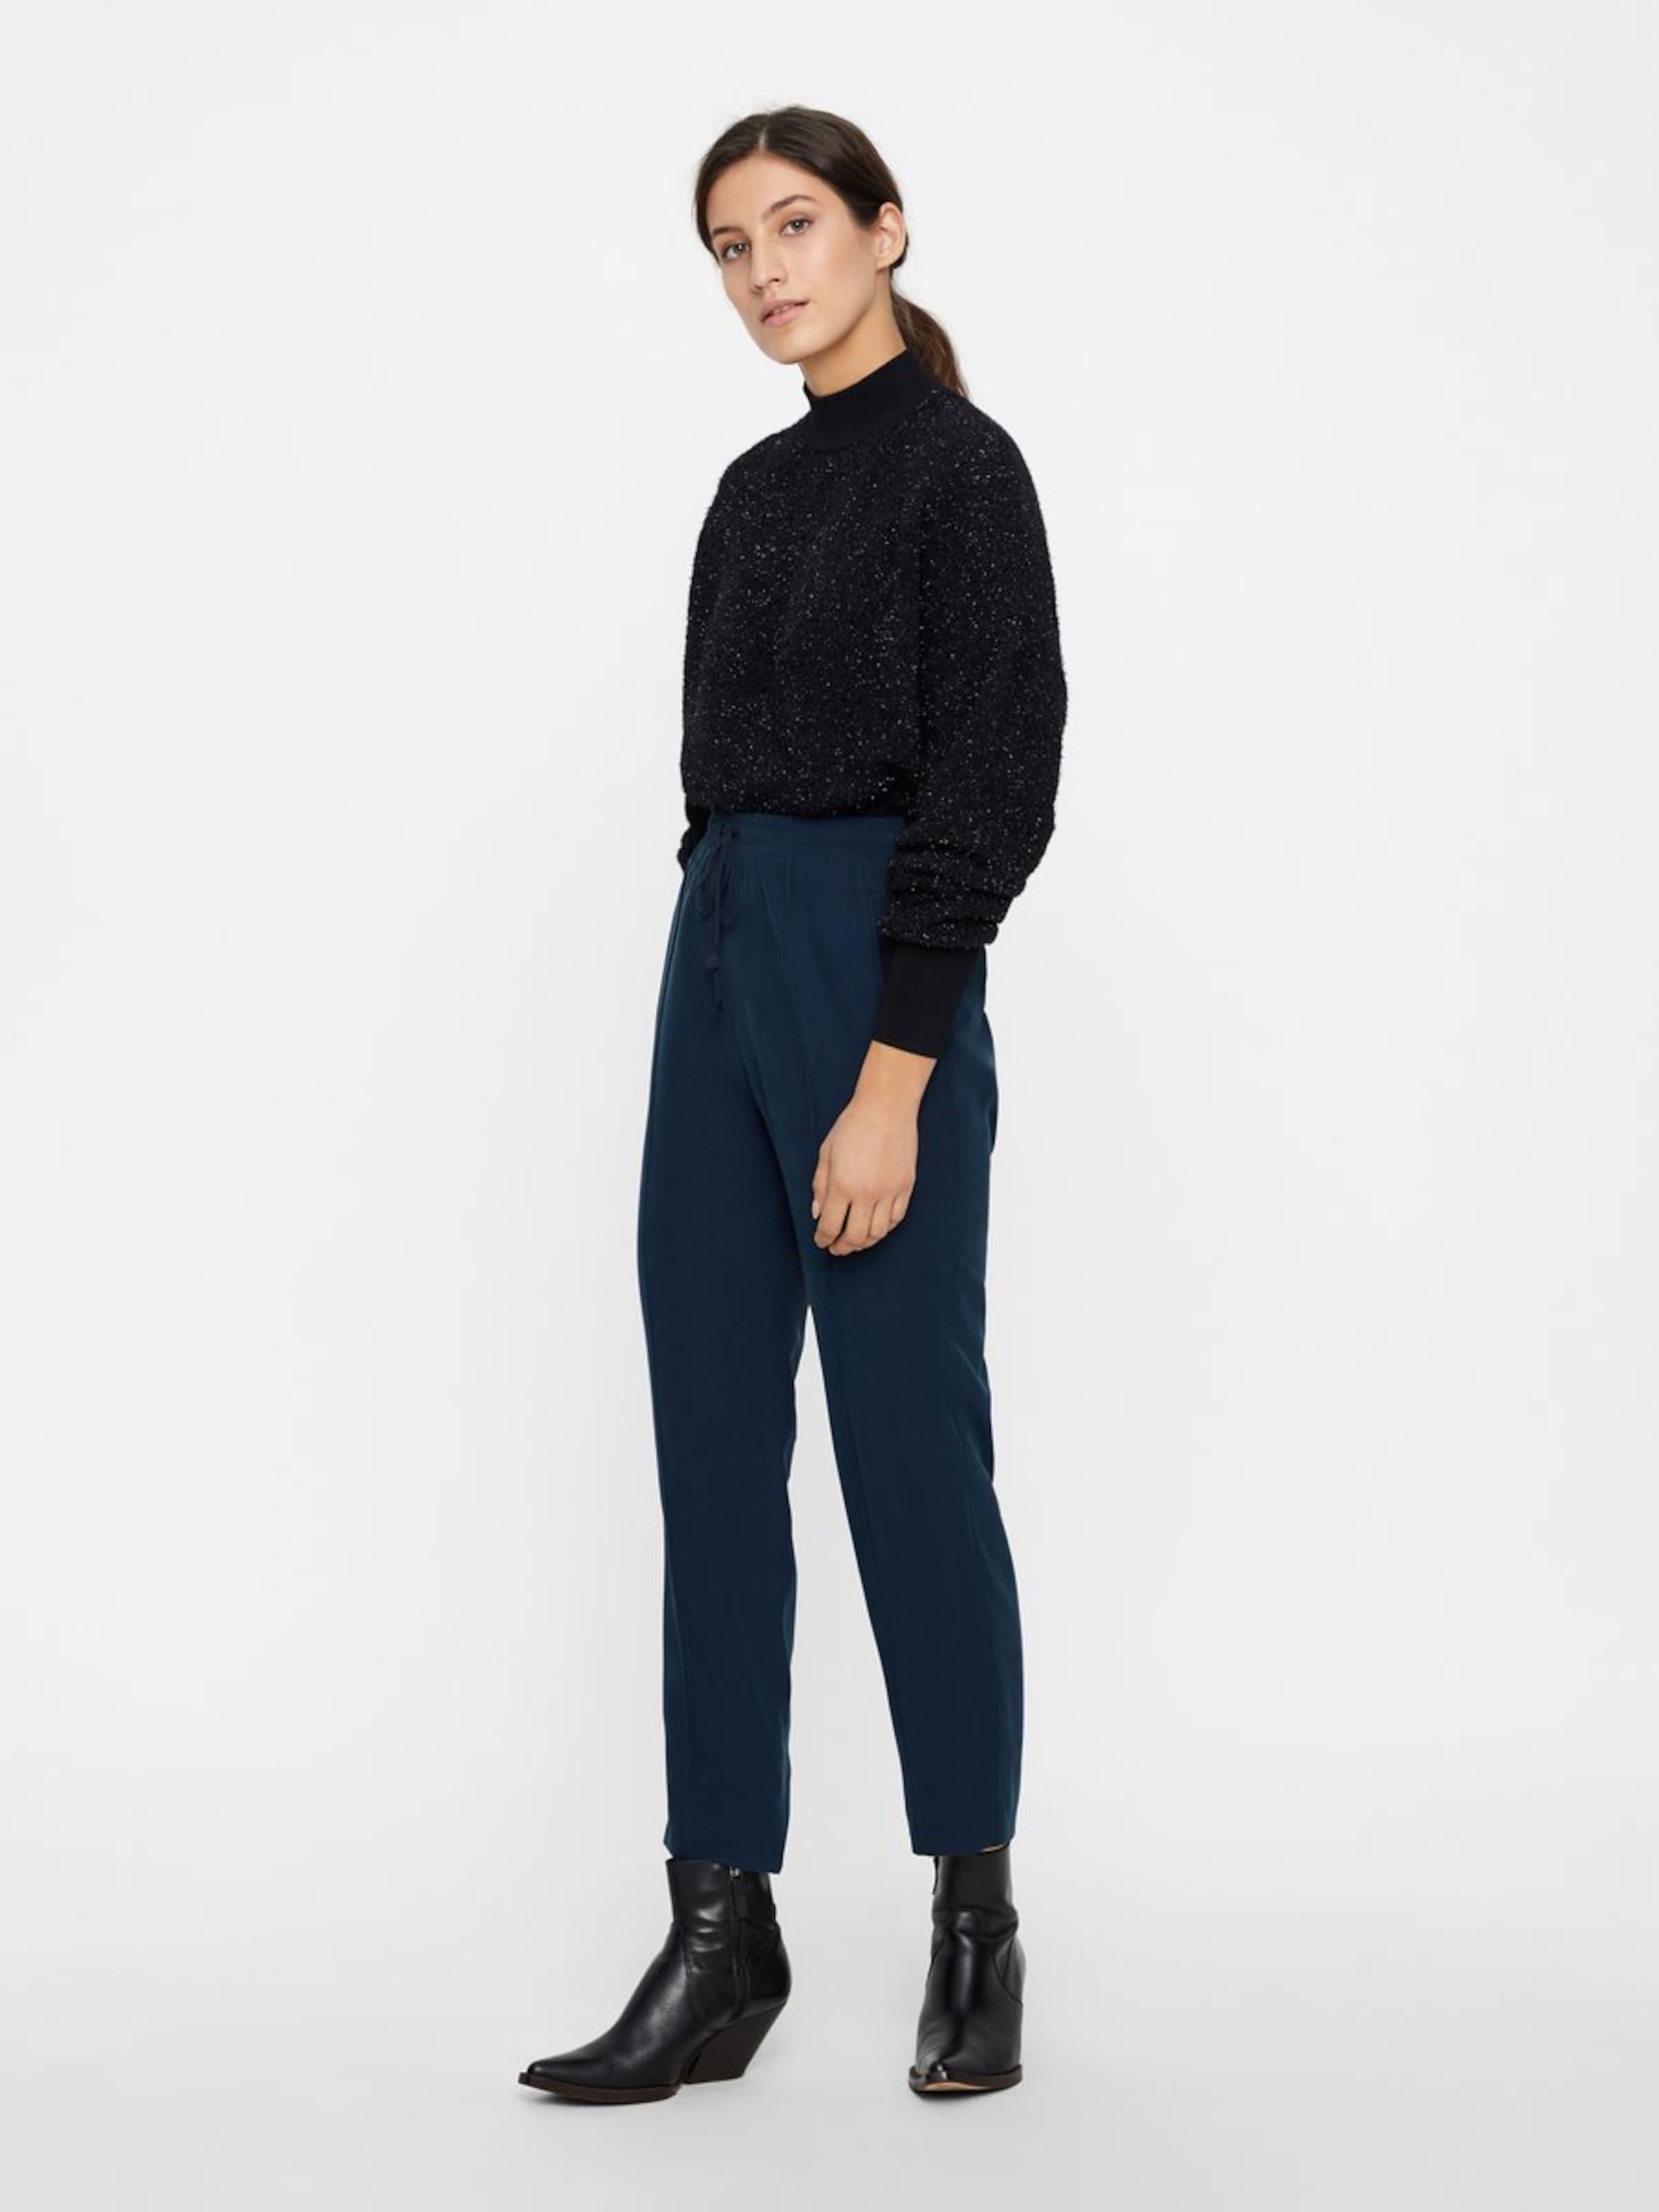 Pantalon a En Y s Bleu Nuit K1FlJcT